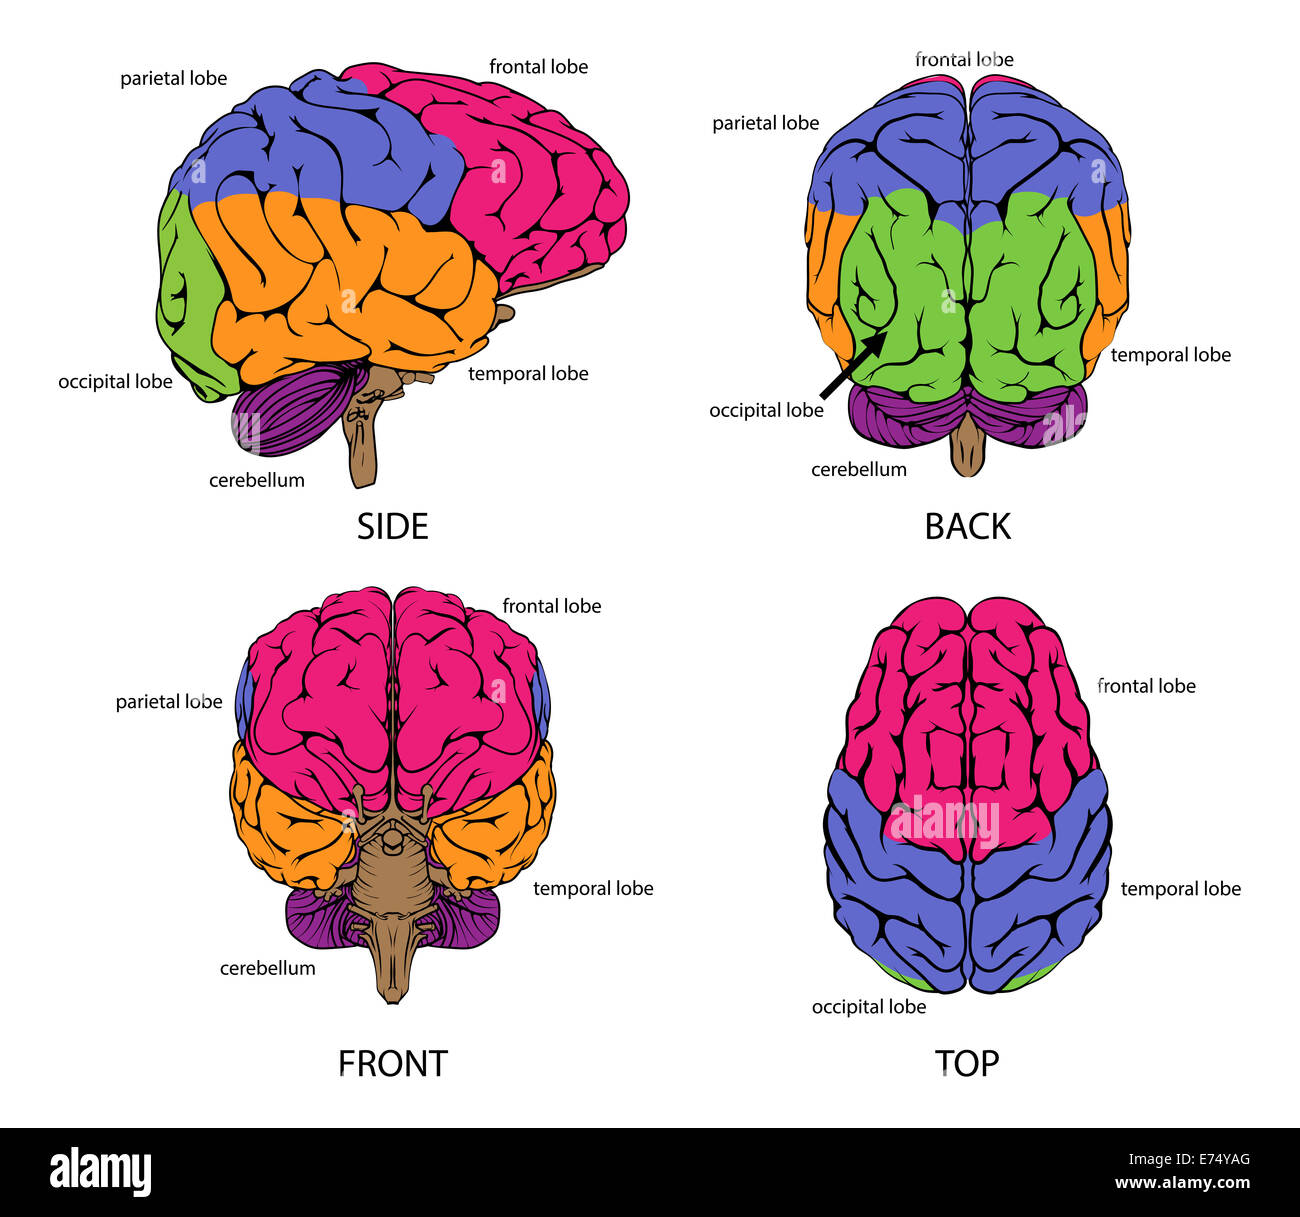 Human Brain Side Diagram Stock Photos Amp Human Brain Side